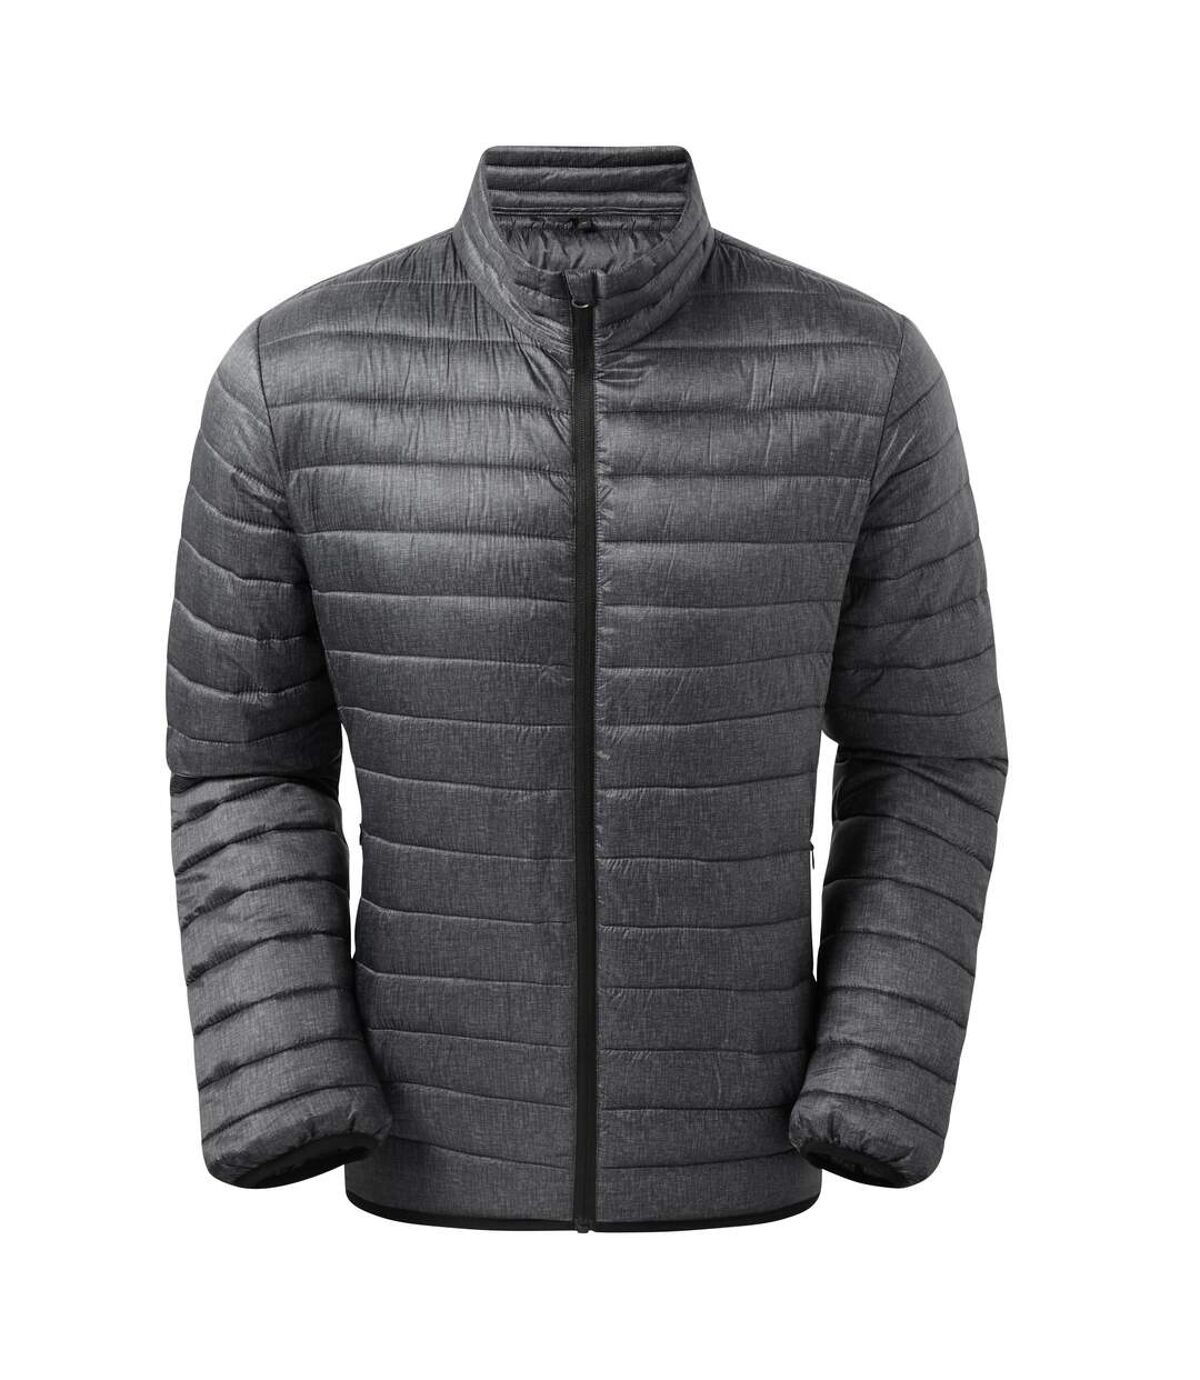 2786 Mens Melange Padded Jacket (Charcoal Melange) - UTRW7331